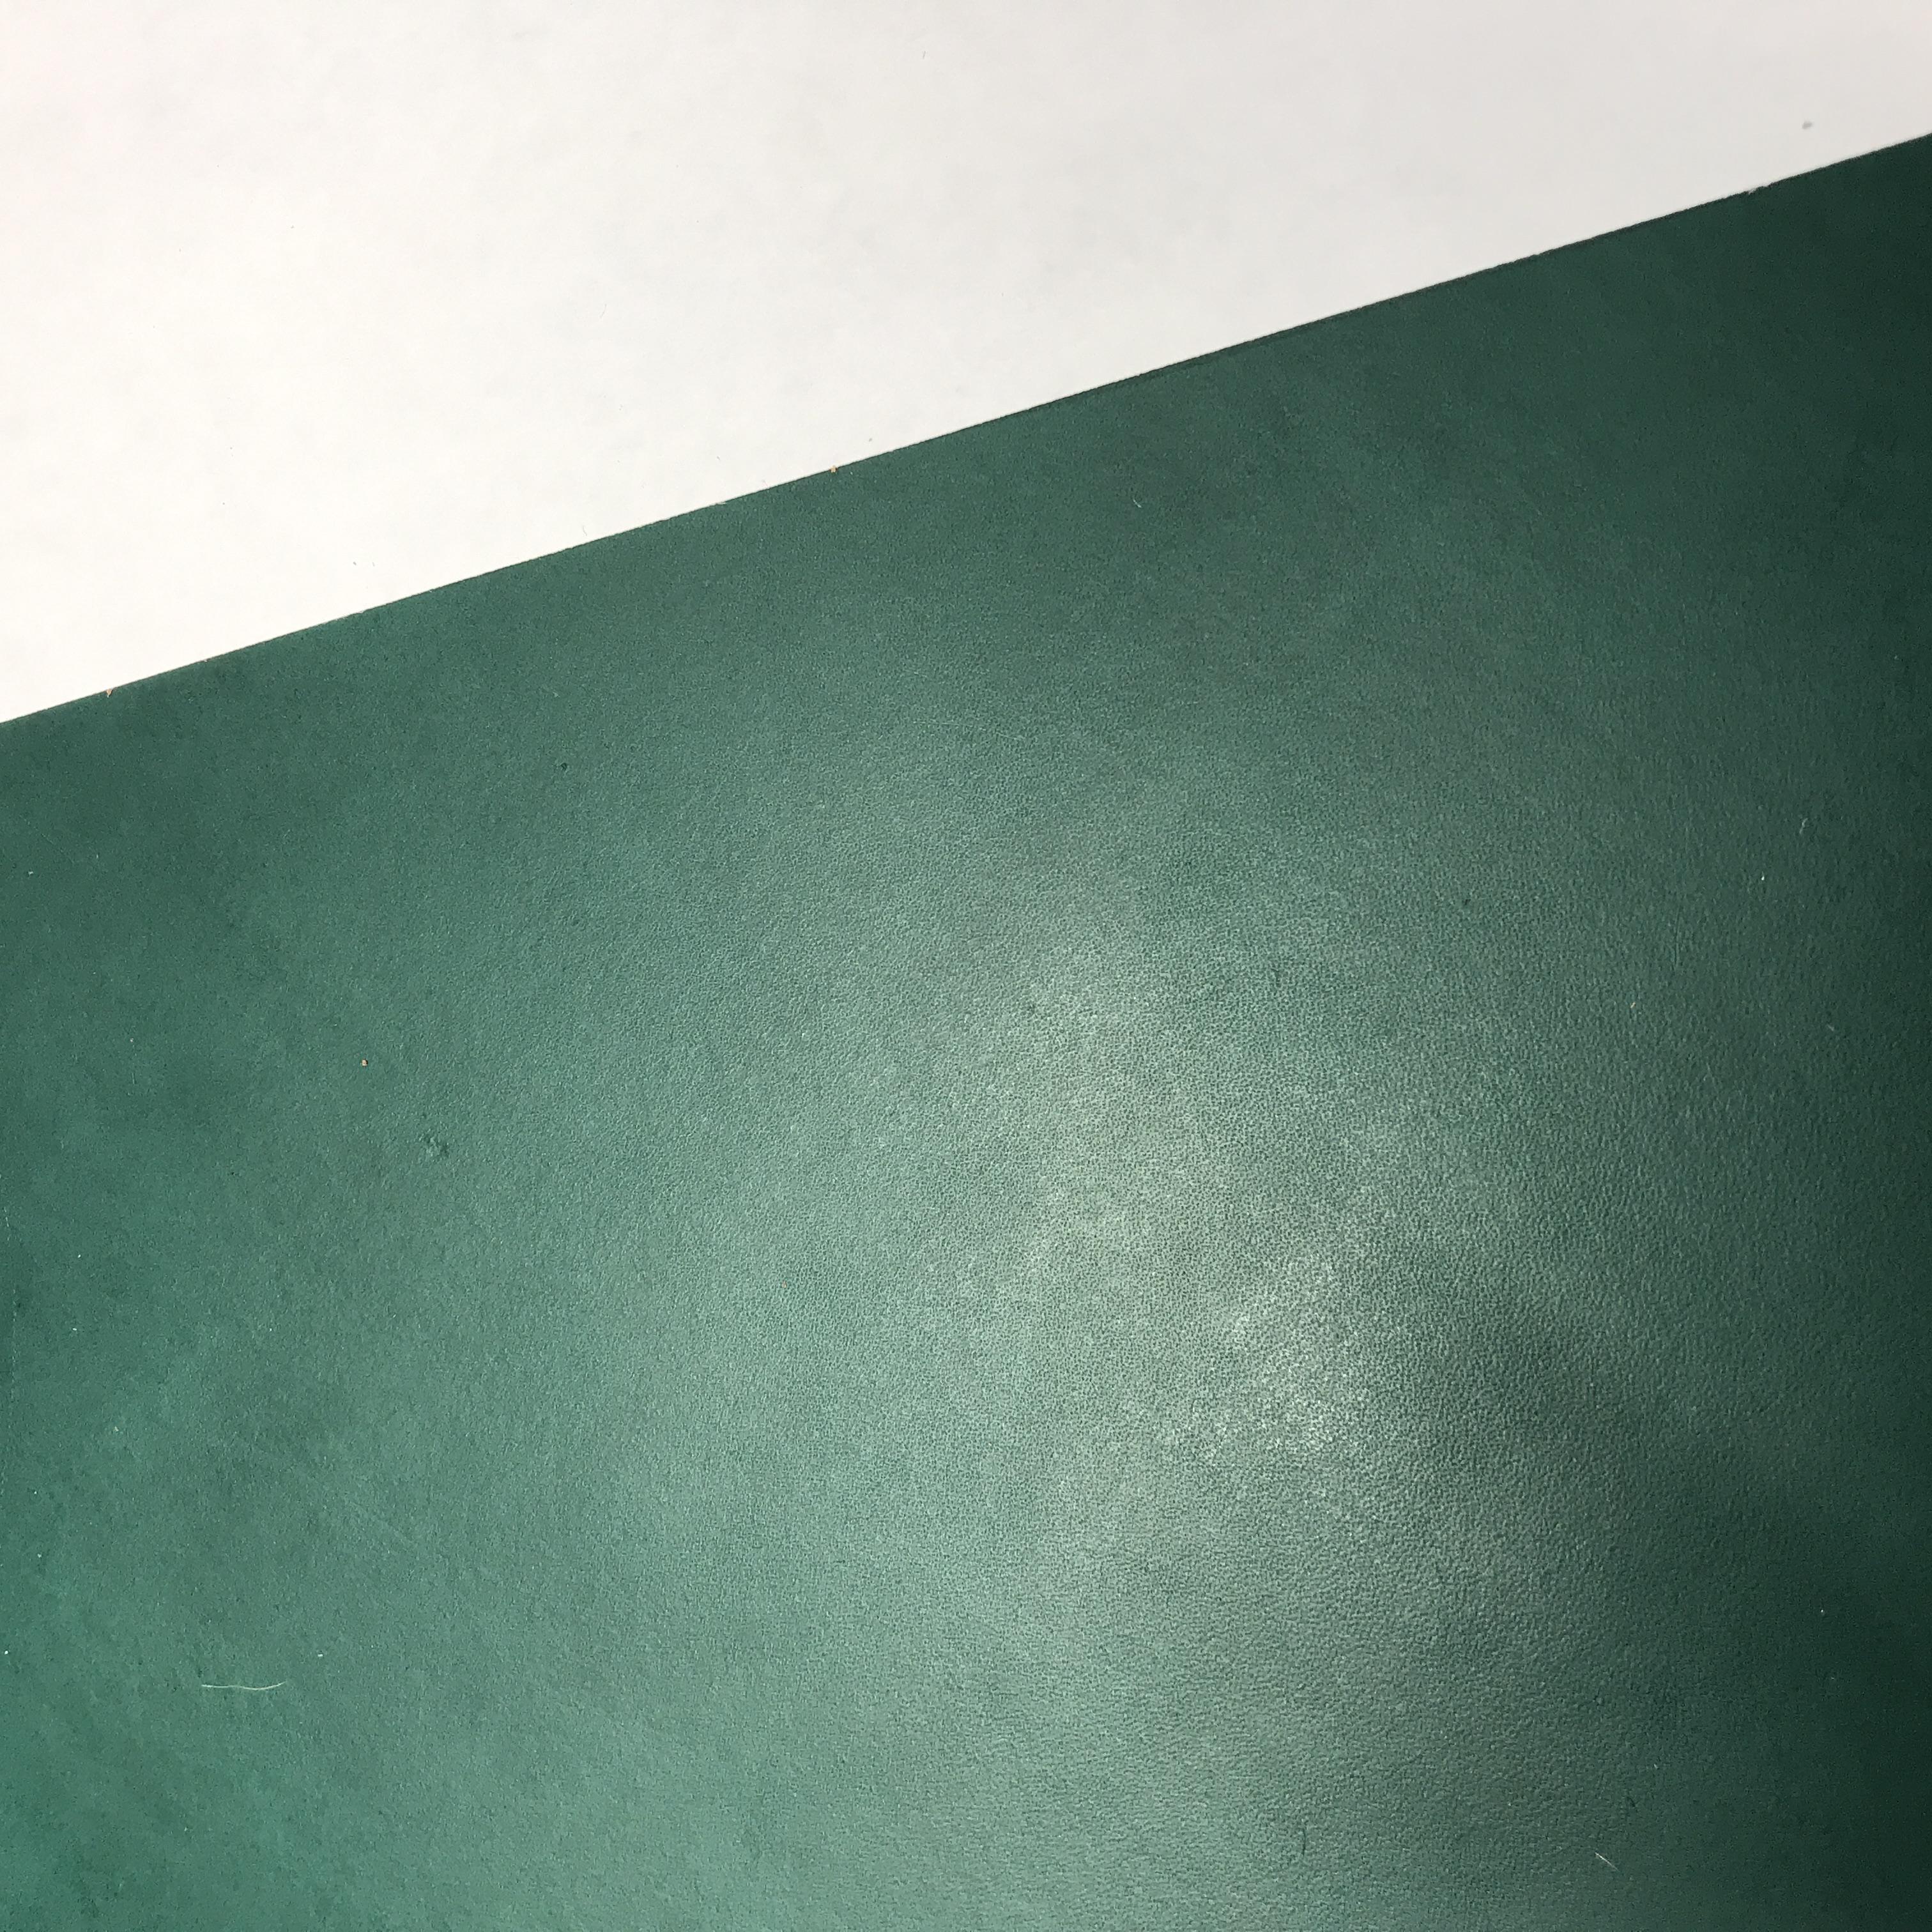 Greenish Turquoise